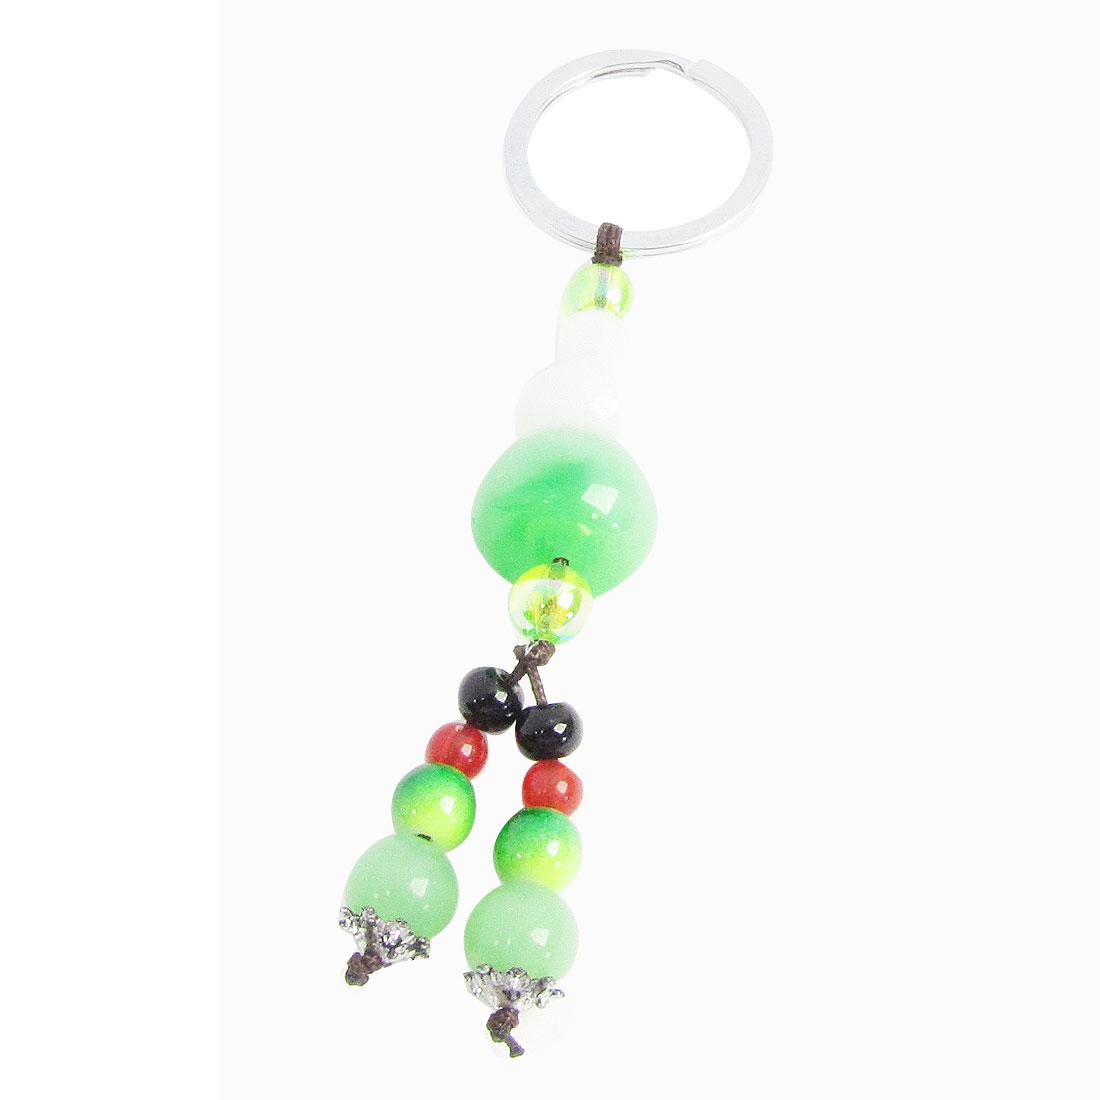 Calabash Plastic Jade Green White Pendant Metal 3cm Dia Keyring Key Ring